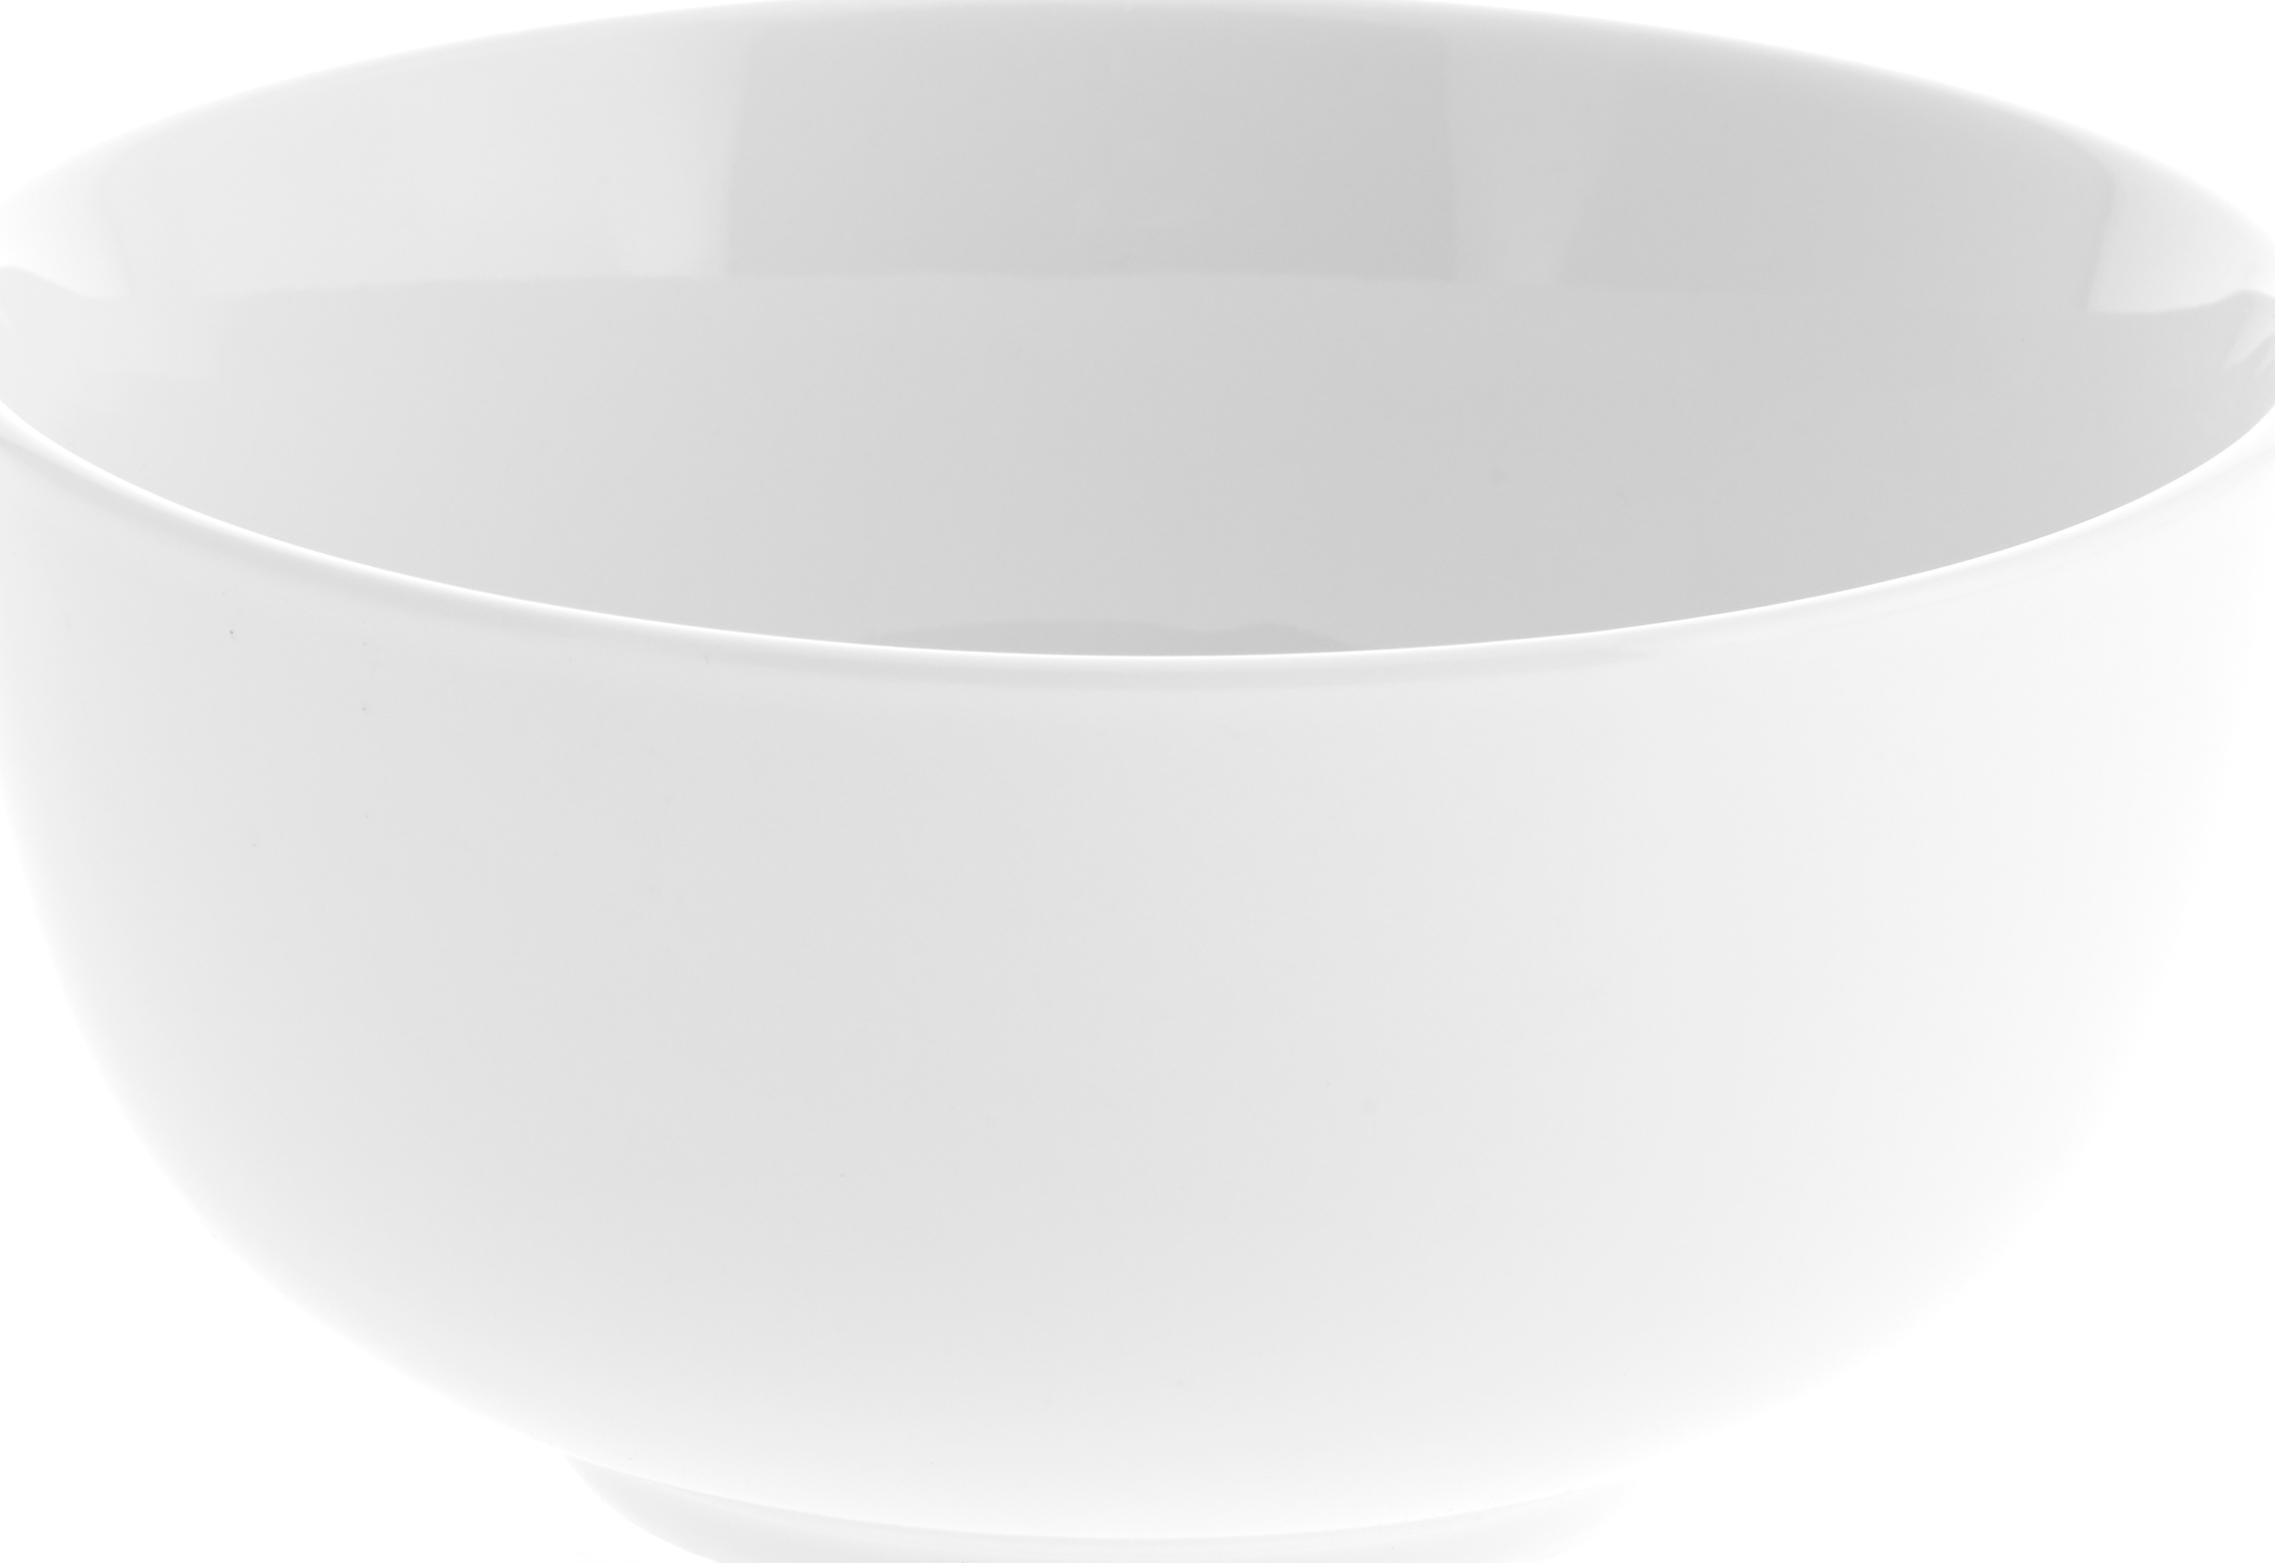 Miska Delight, 2 szt., Porcelana, Biały, Ø 14 x W 7 cm